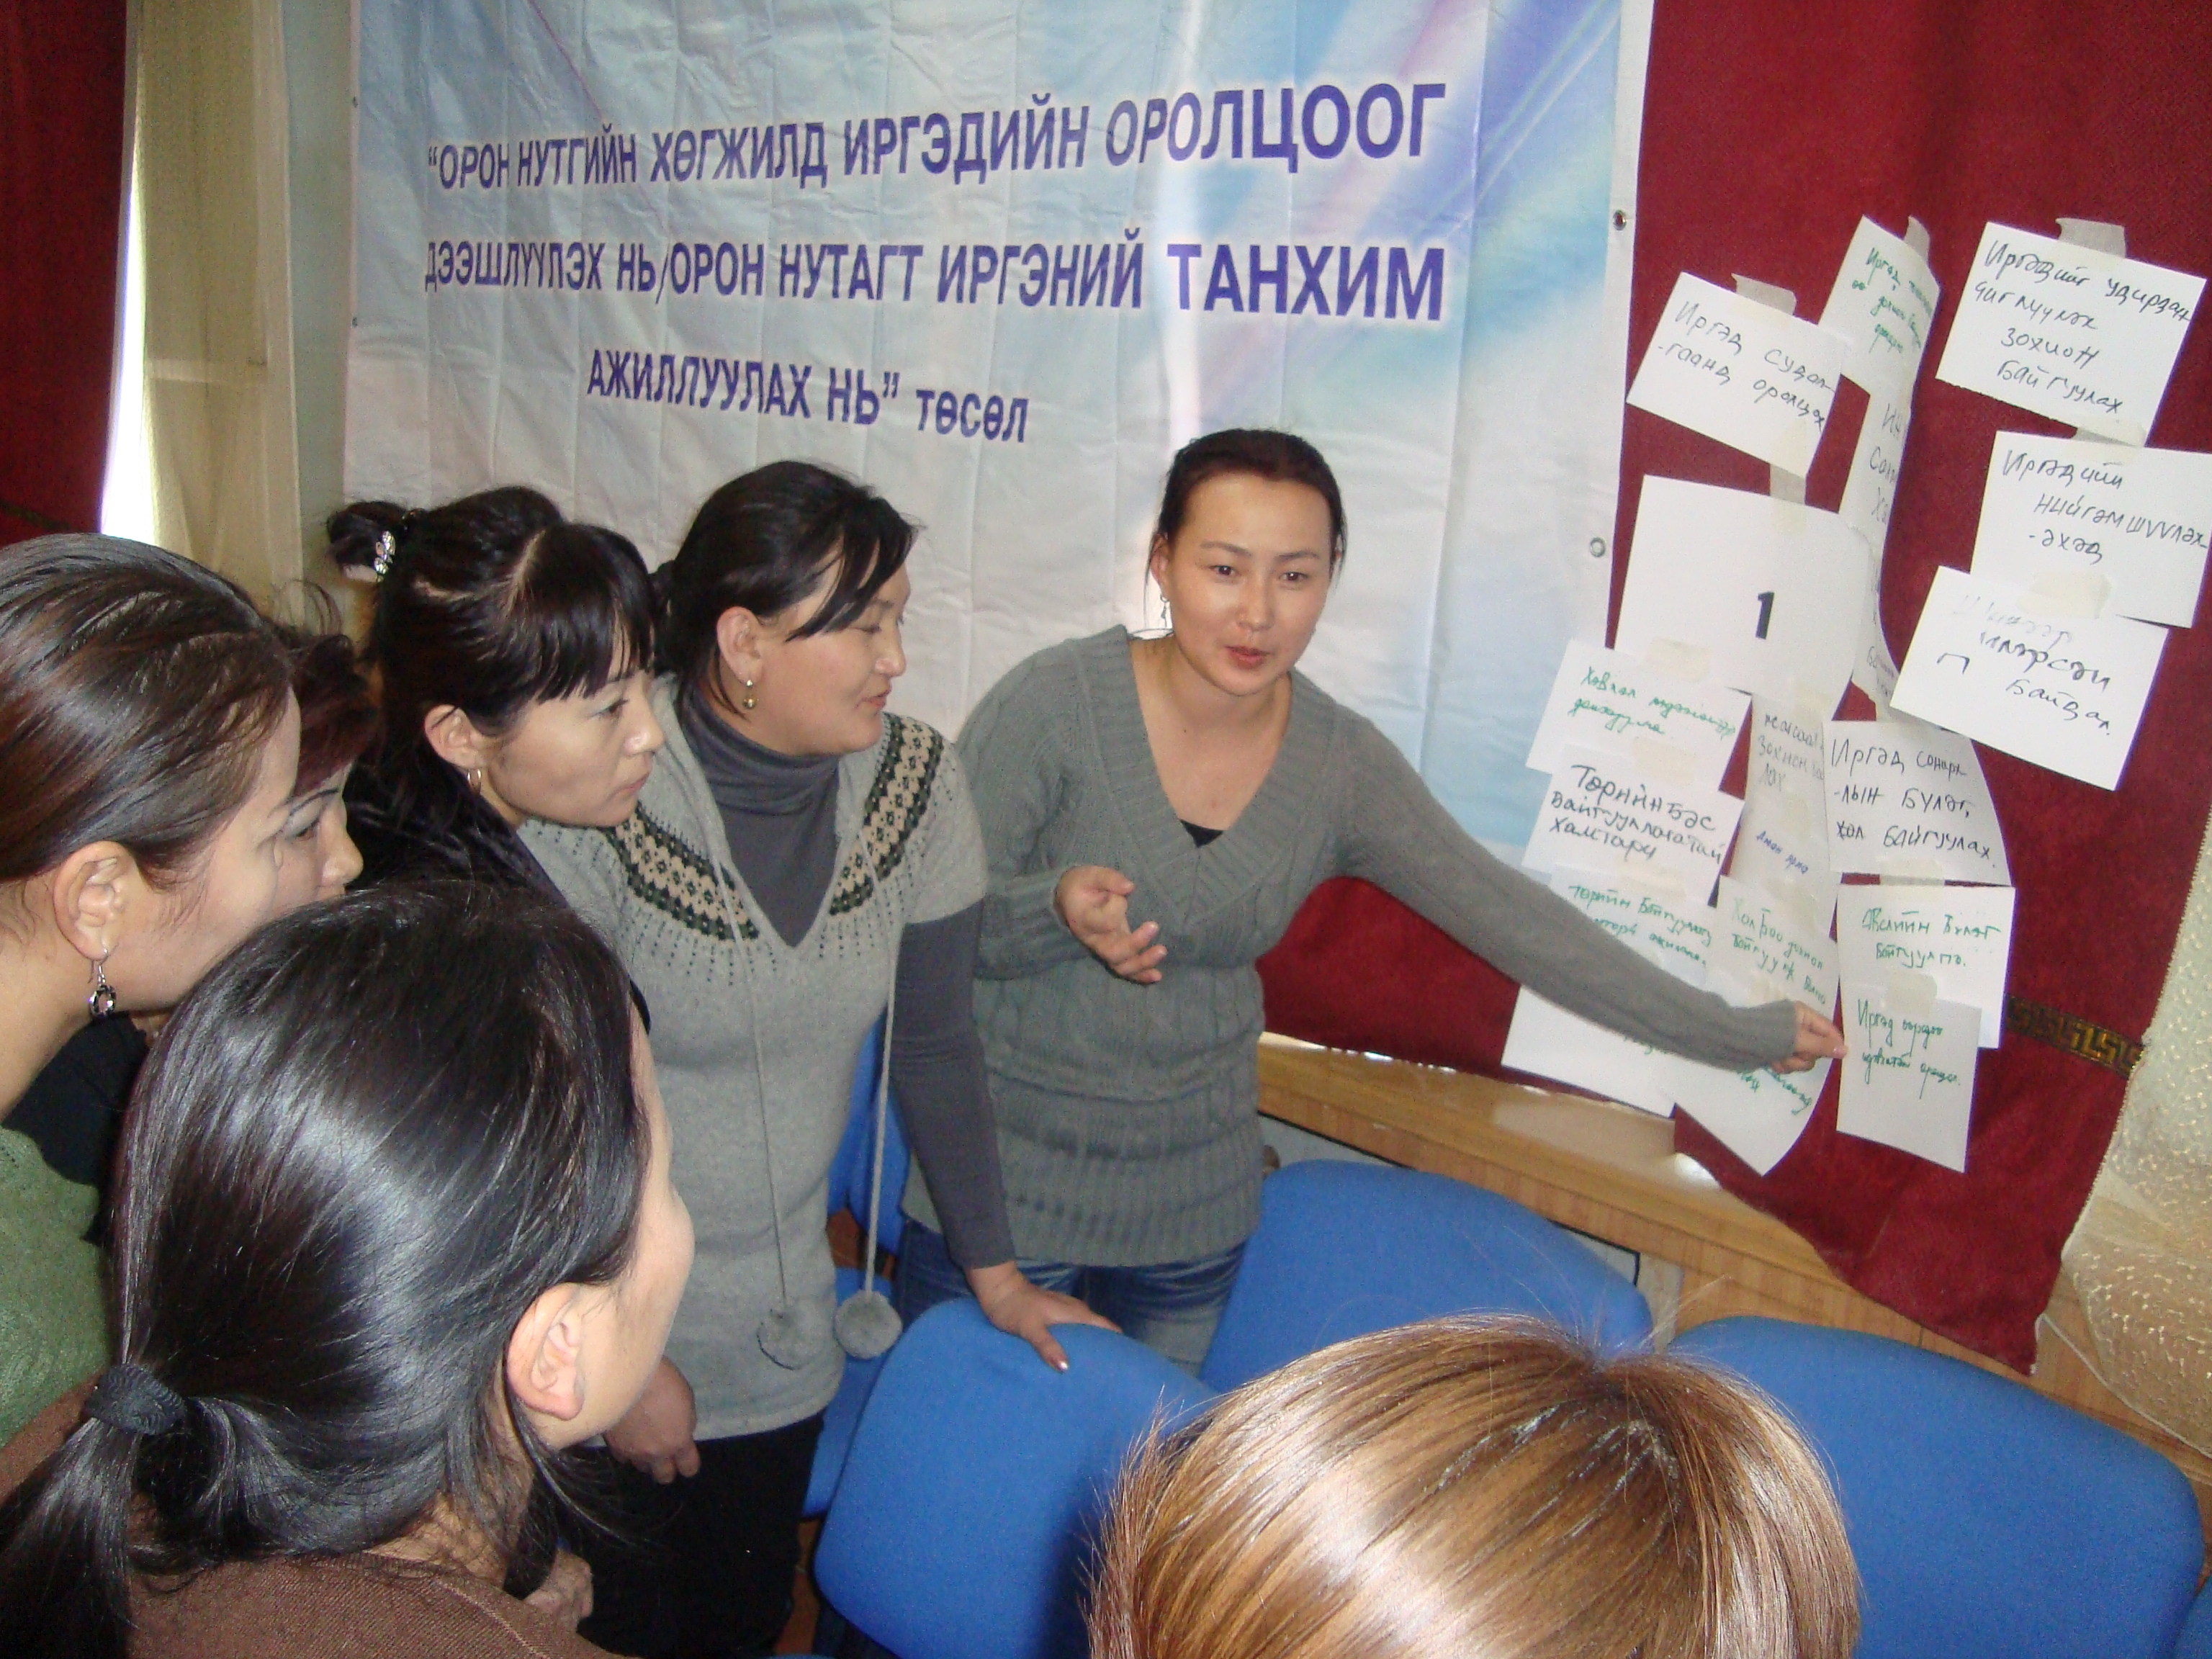 Women for Social Progress Movement, Dornogovi province, 2010